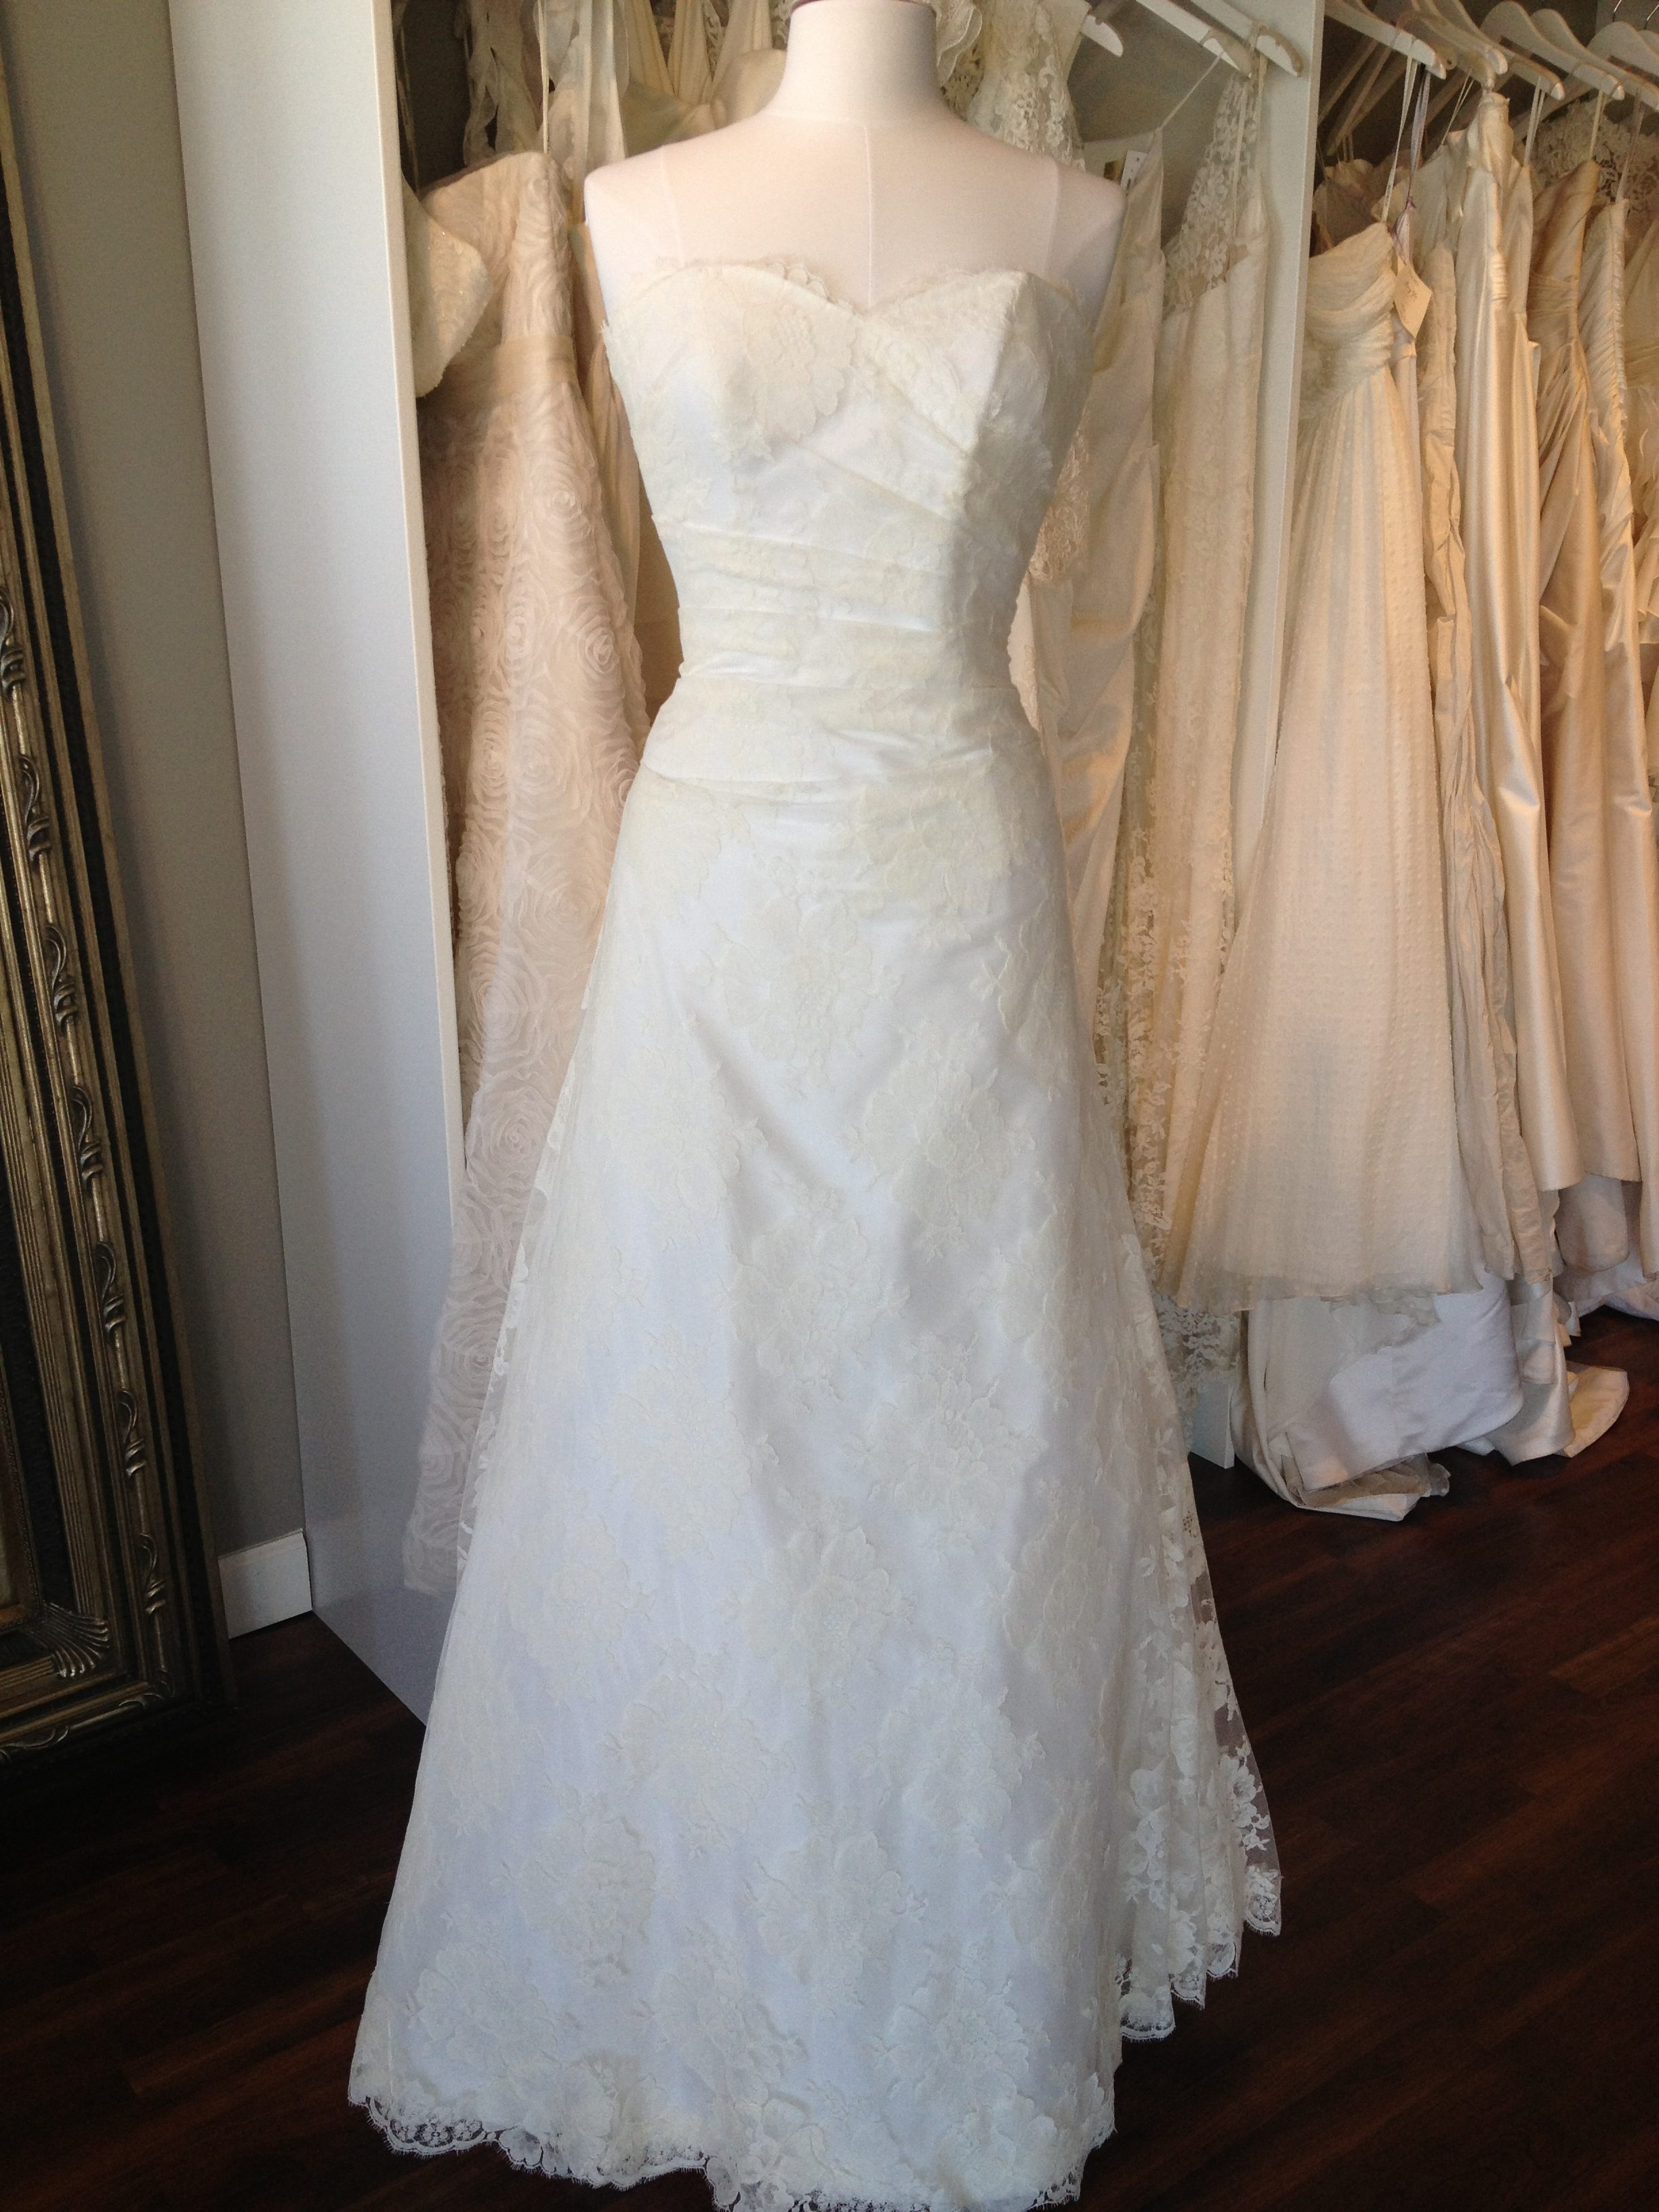 New Modern Trousseau Wedding Dresses Ready Or Knot Omaha Bridal Shop,Homecoming Wedding Dresses In Sri Lanka